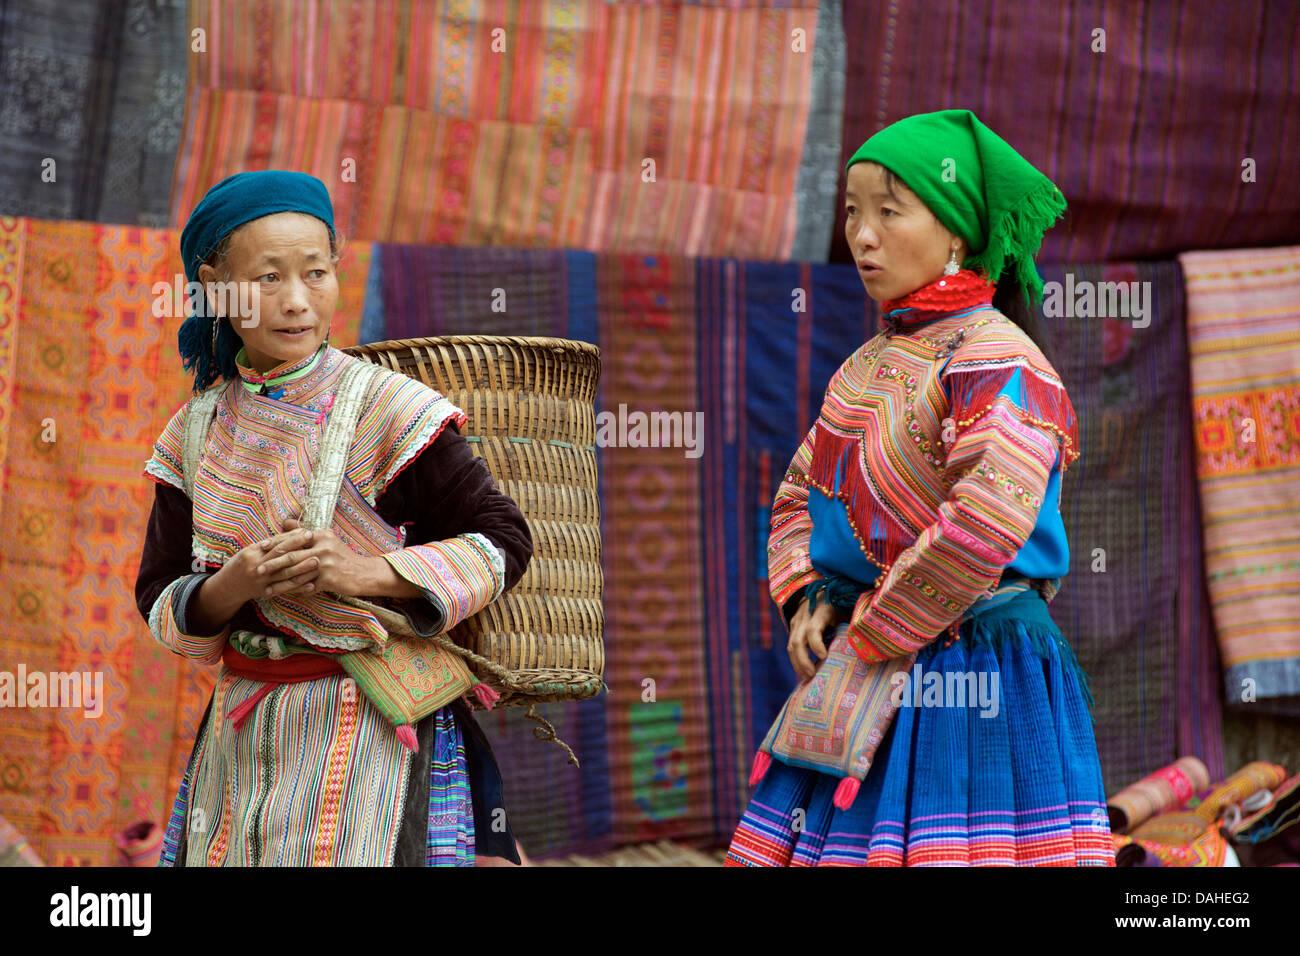 Flower Hmong women at Bac Ha Sunday market. Lao Cai Province, Northern Vietnam - Stock Image